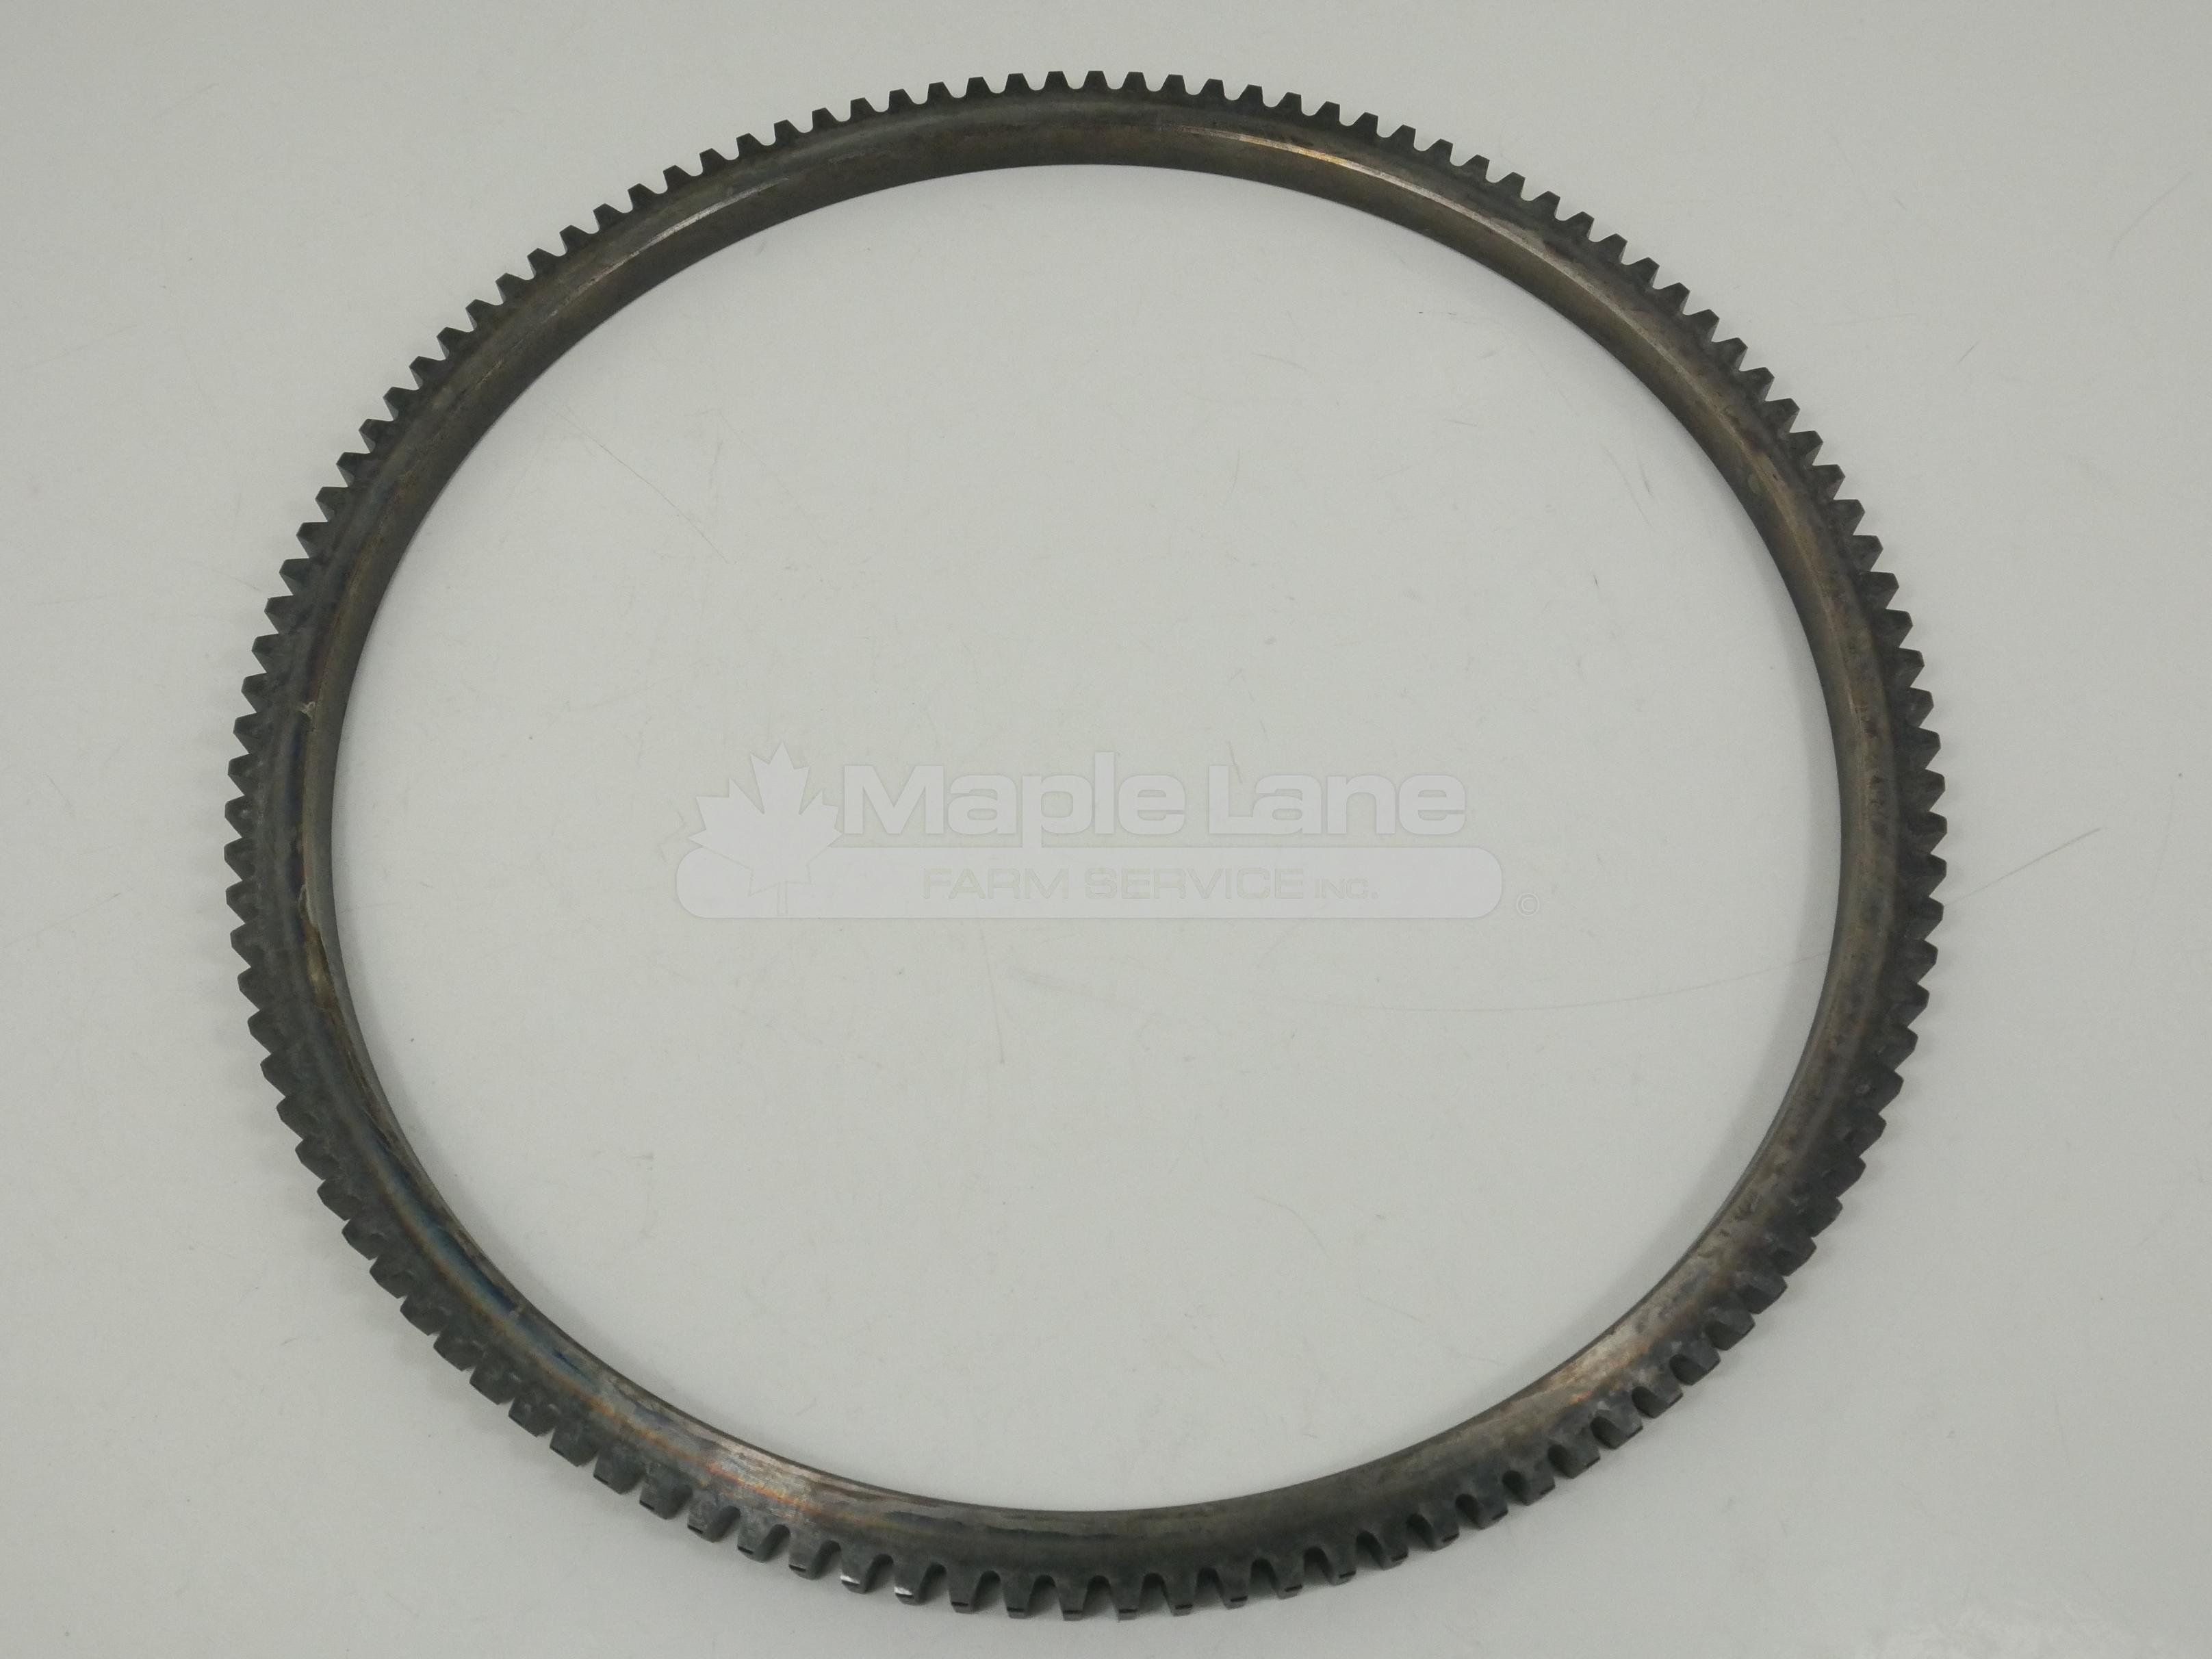 186499 Gear Ring